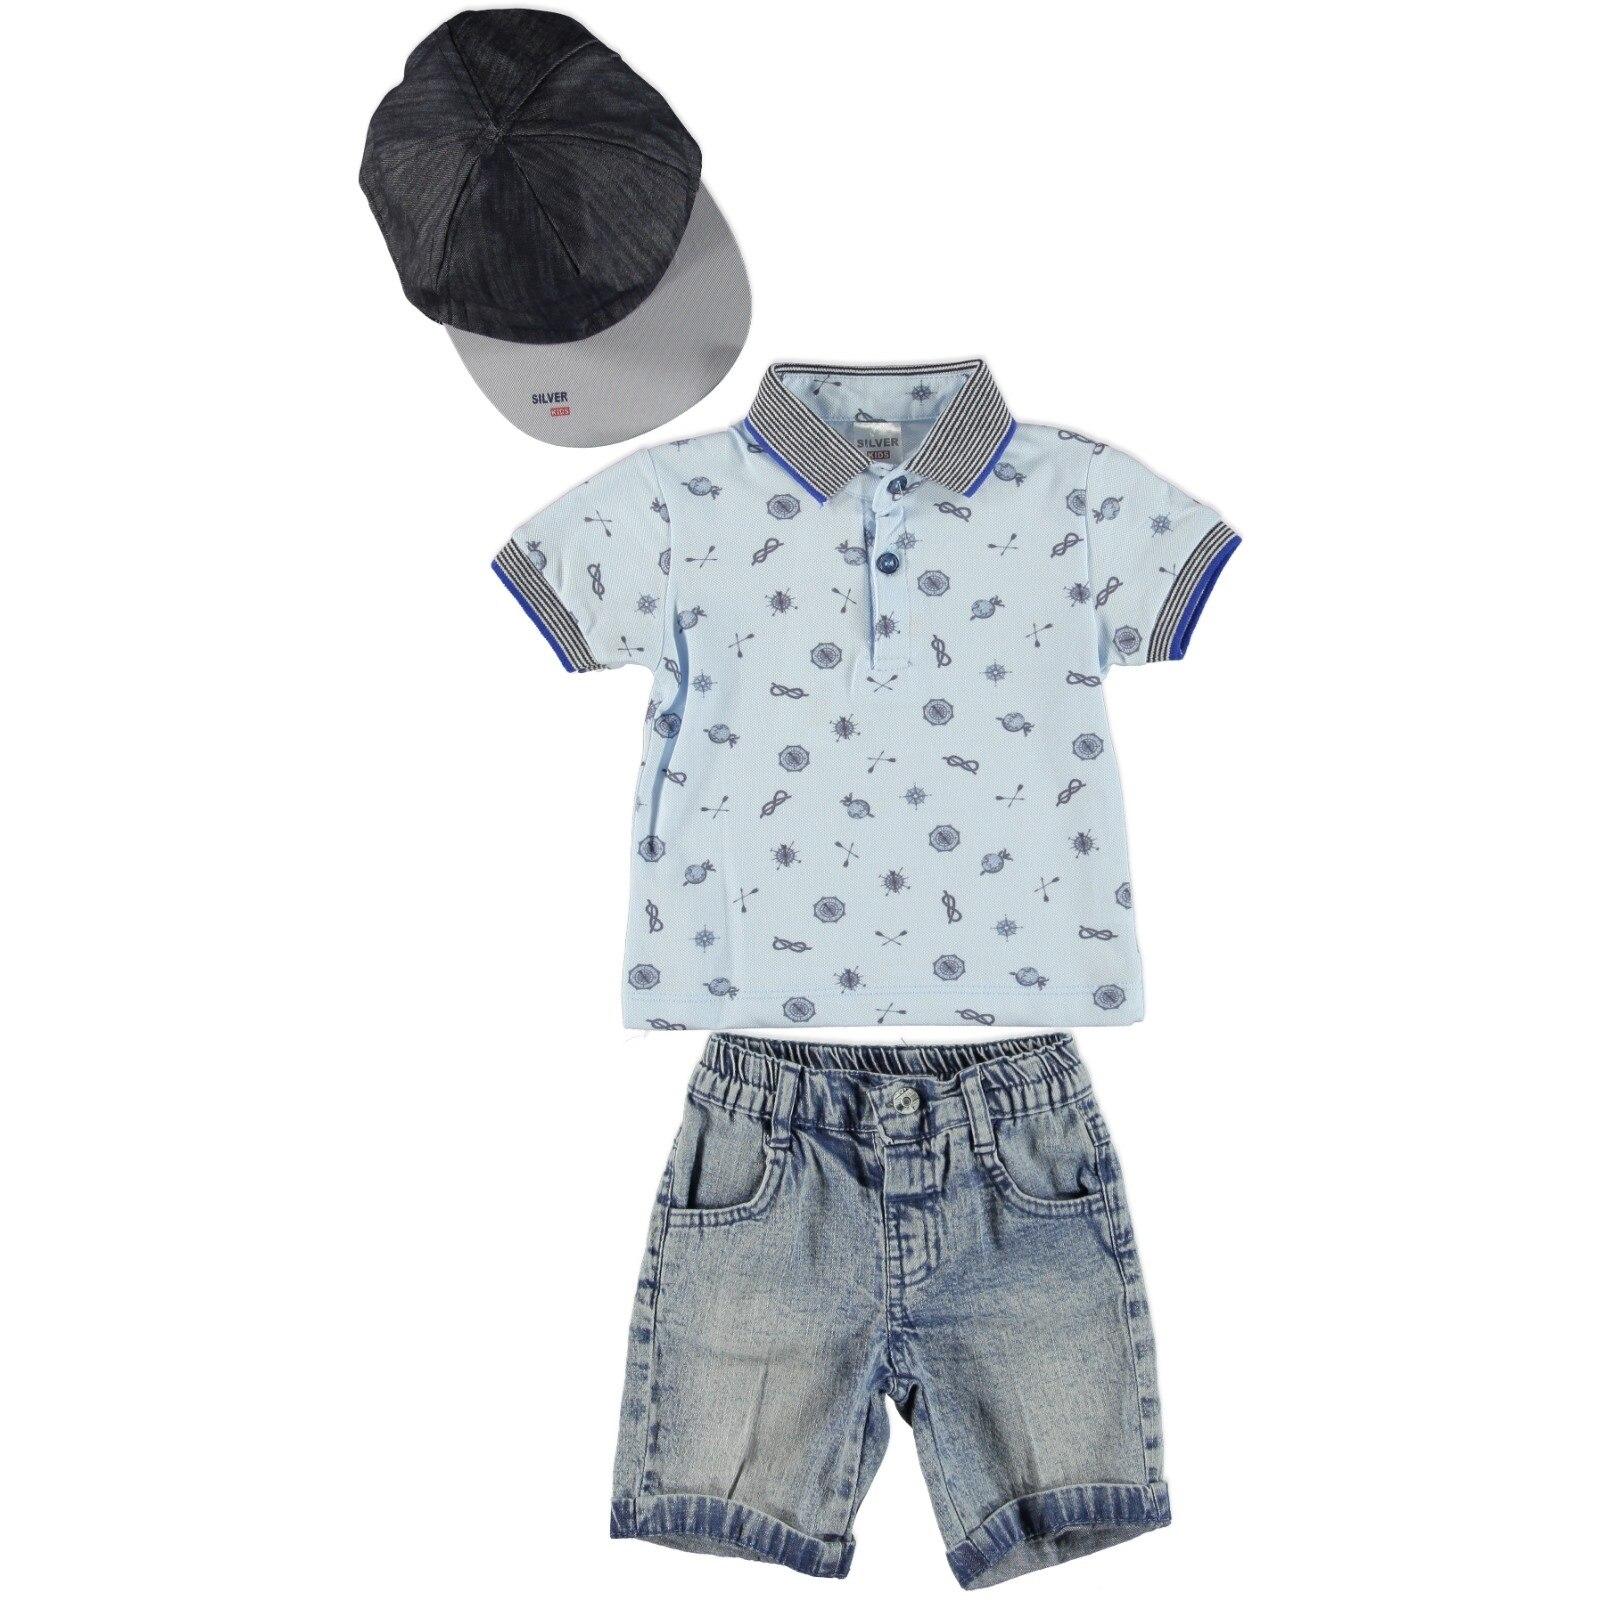 Ebebek Bombili Baby Boy Symbols Printed Polo Neck Tshirt Denim Short Set 3pcs